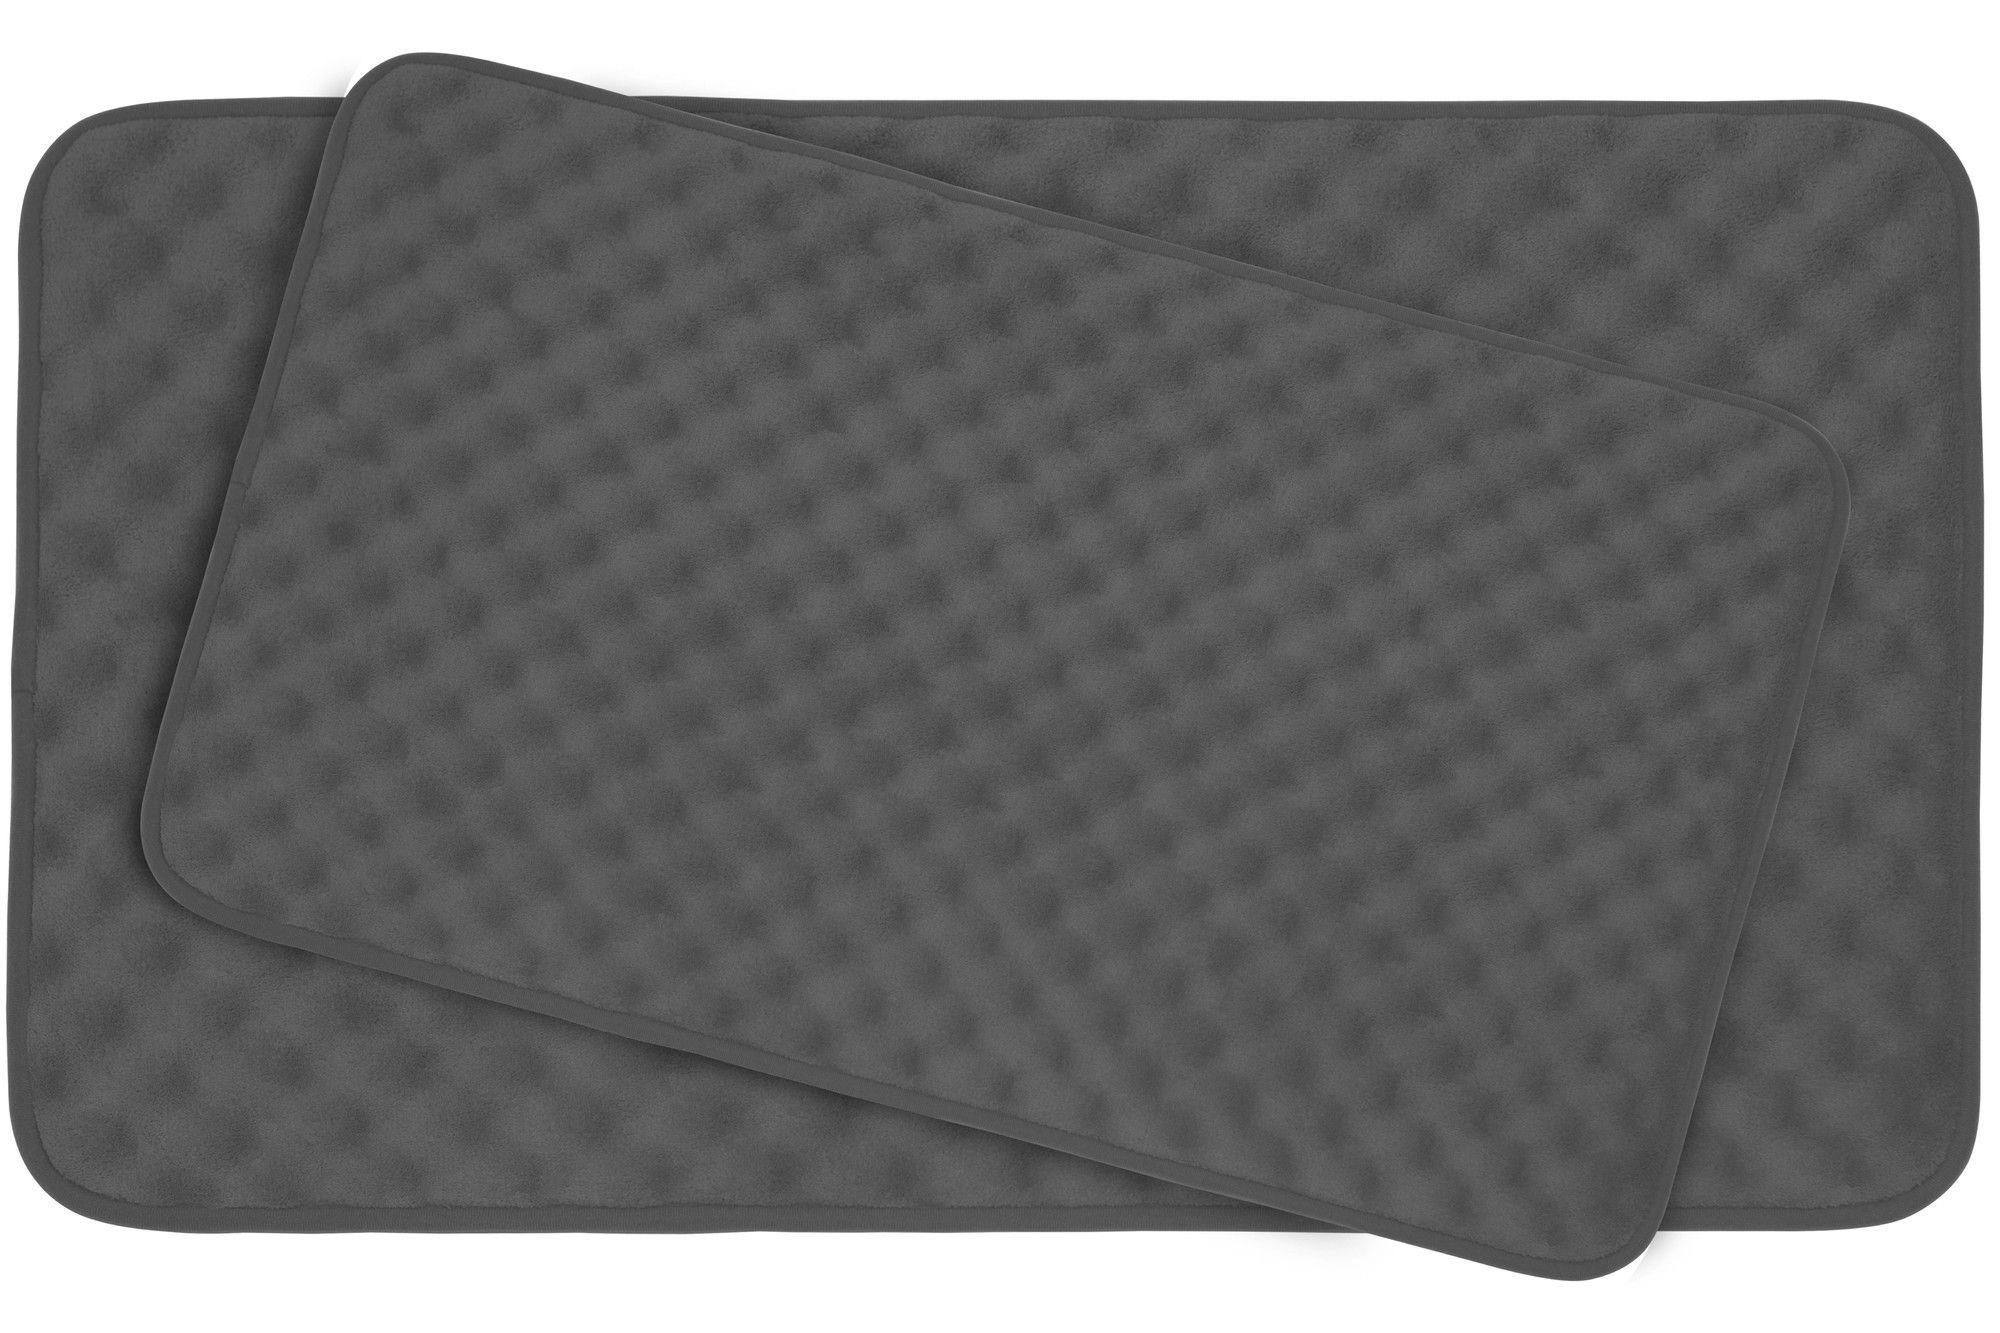 Massage Premium Micro Plush Memory Foam Bath Mat Set Products